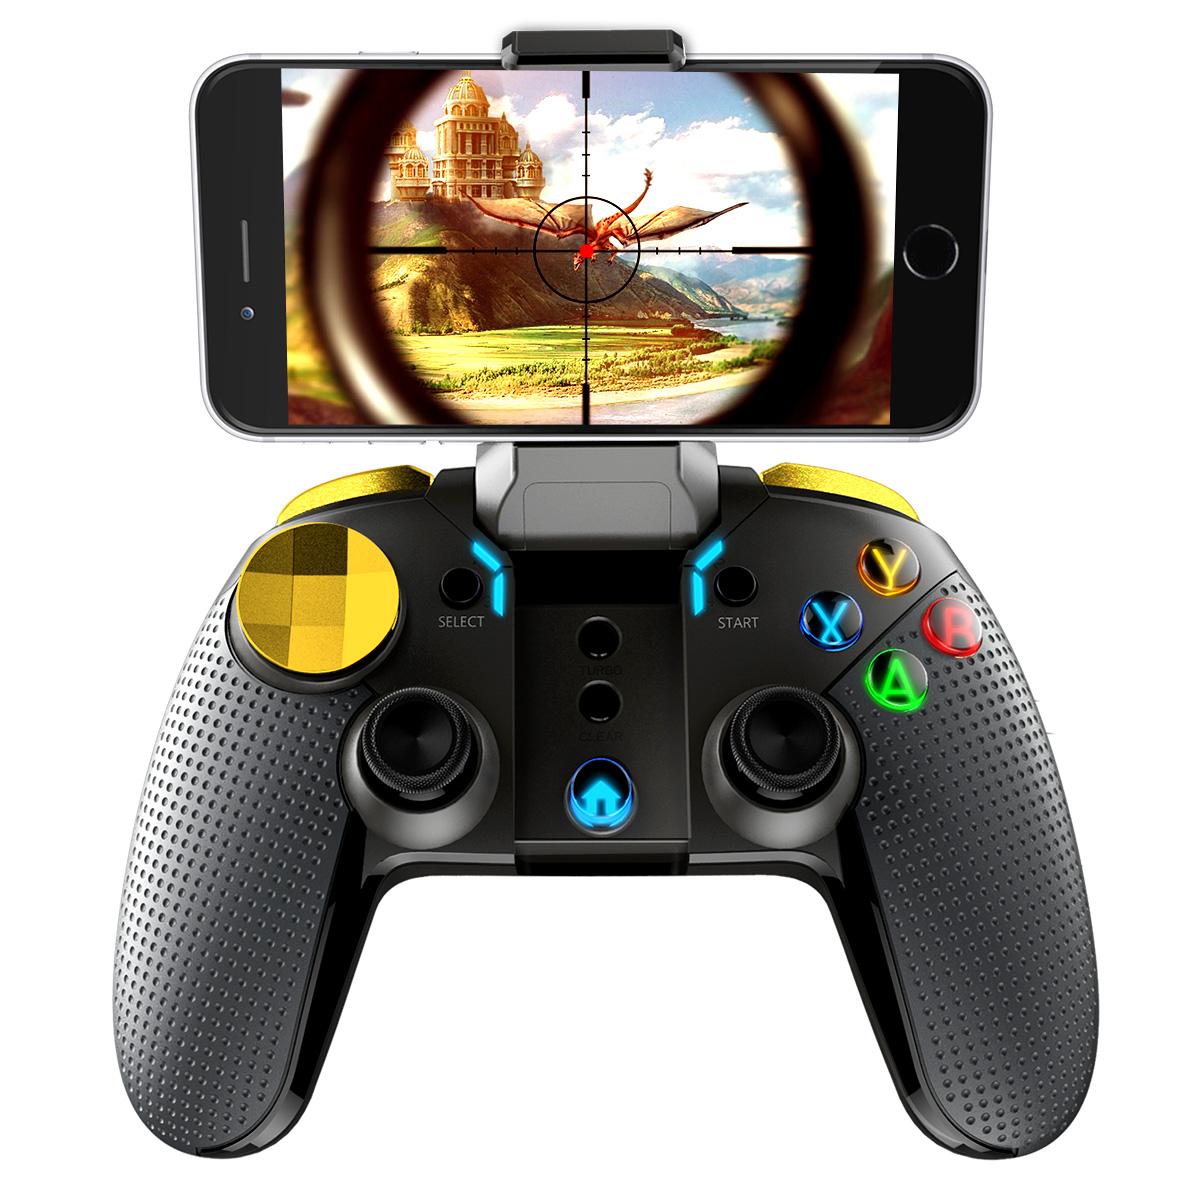 Gamepad] PG-9118 Golden Warrior Bluetooth gamepad PUBG